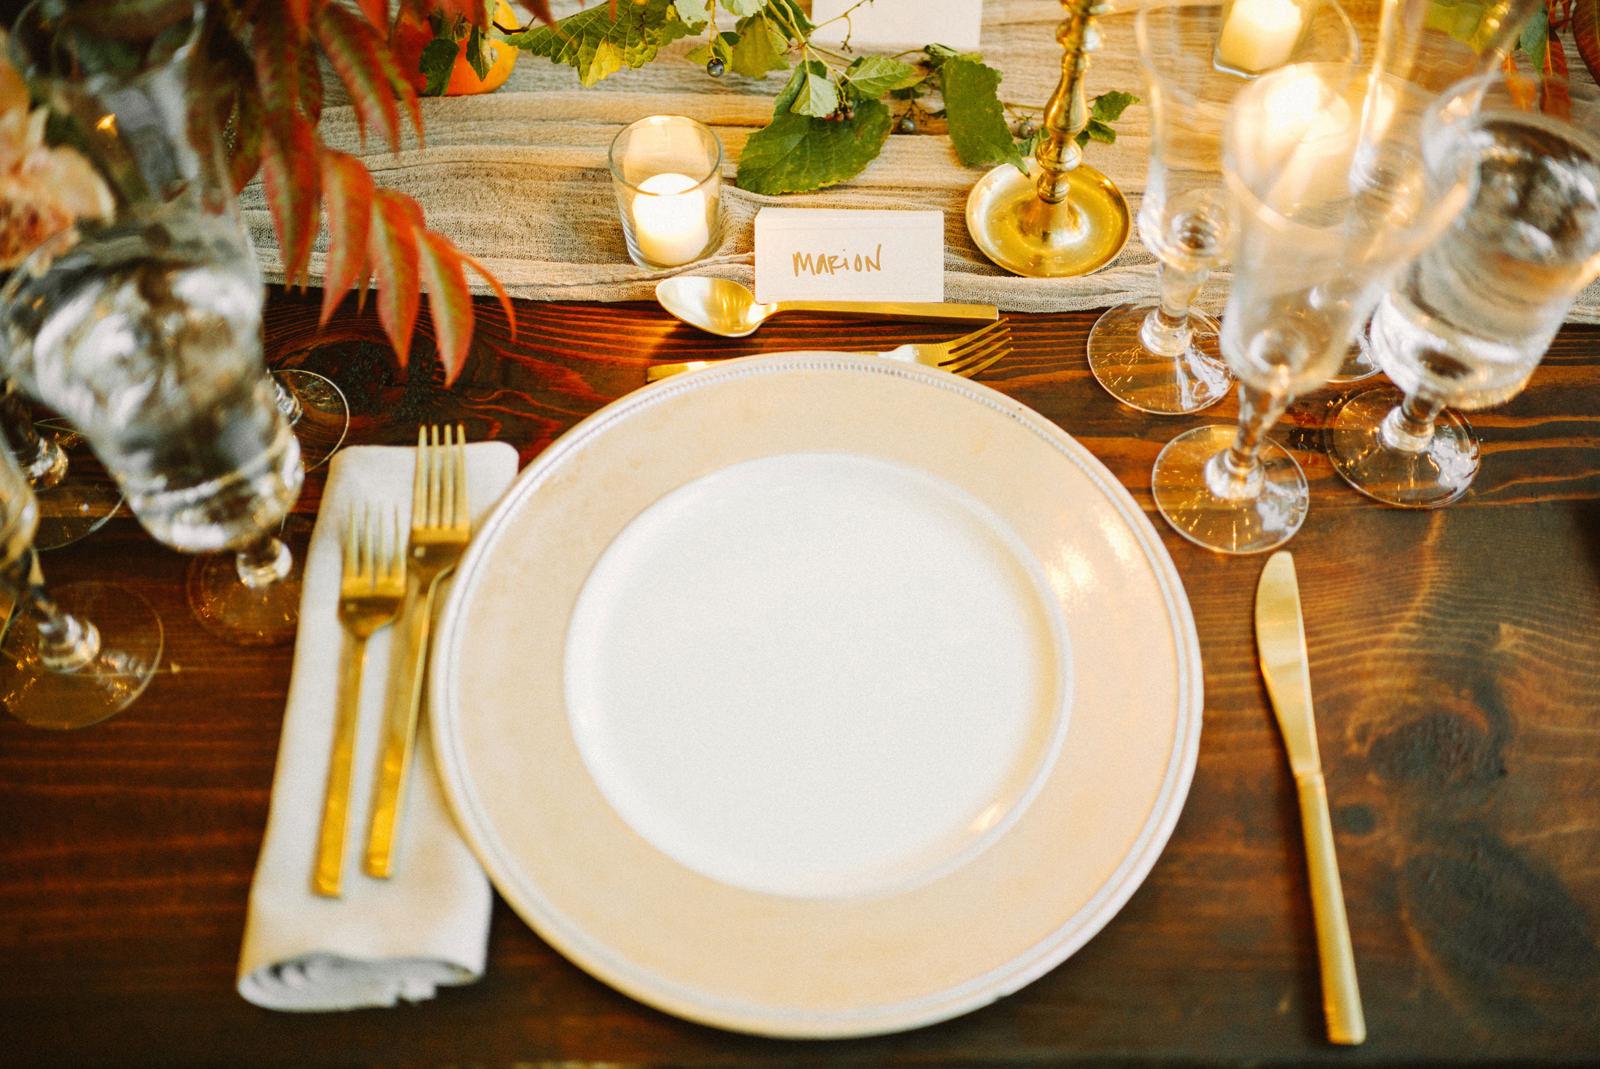 bridgeport-wedding-129 BRIDGEPORT, CONNECTICUT BACKYARD WEDDING